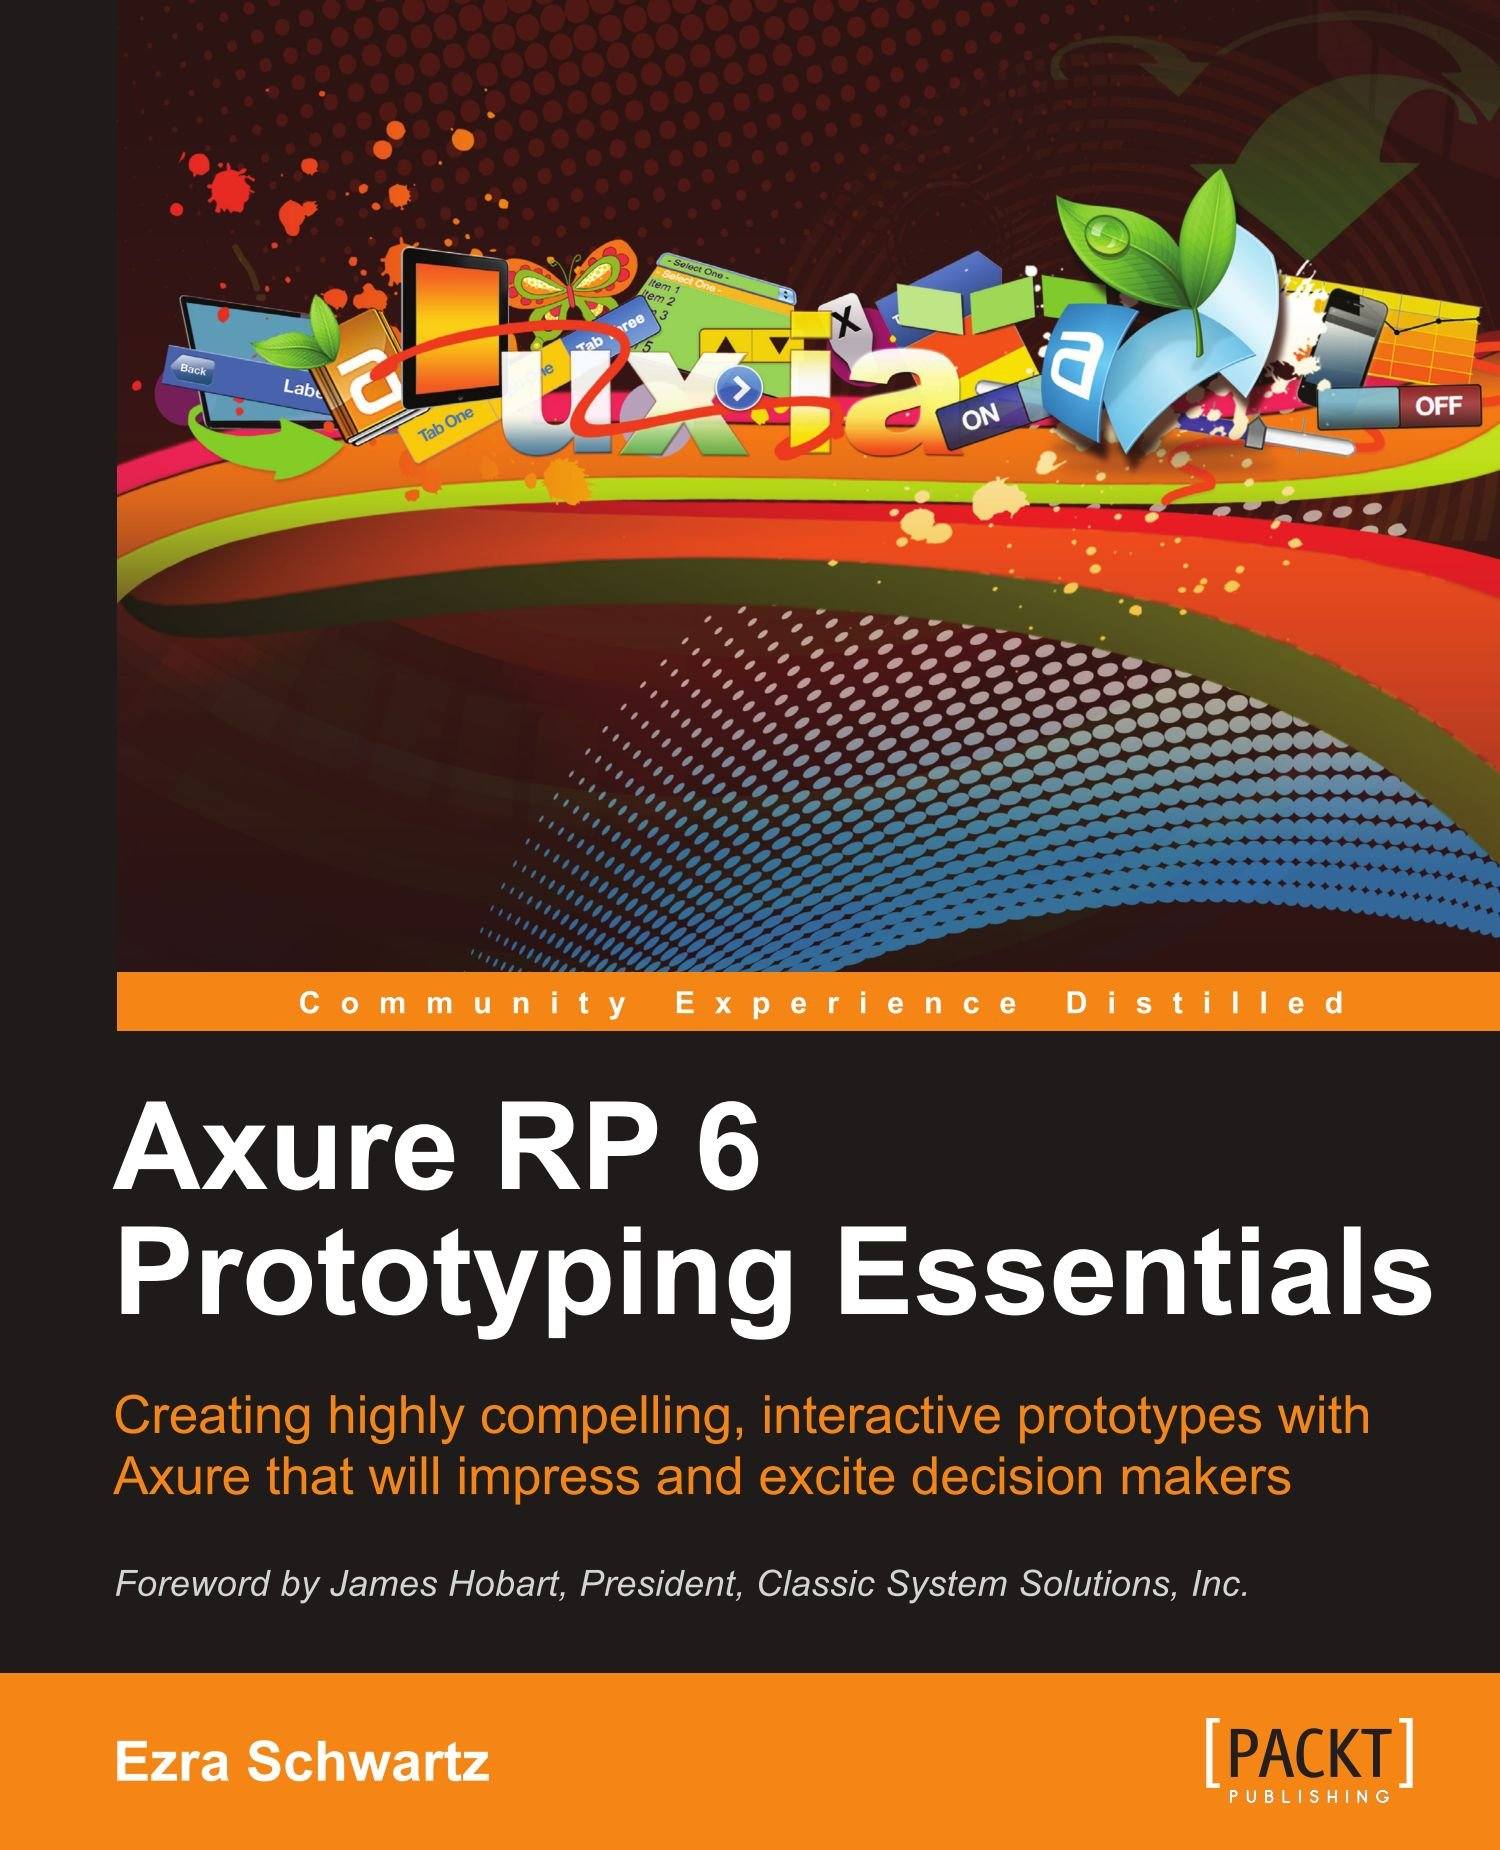 Axure RP 6 Prototyping Essentials: Ezra Schwartz: 9781849691642:  Amazon.com: Books